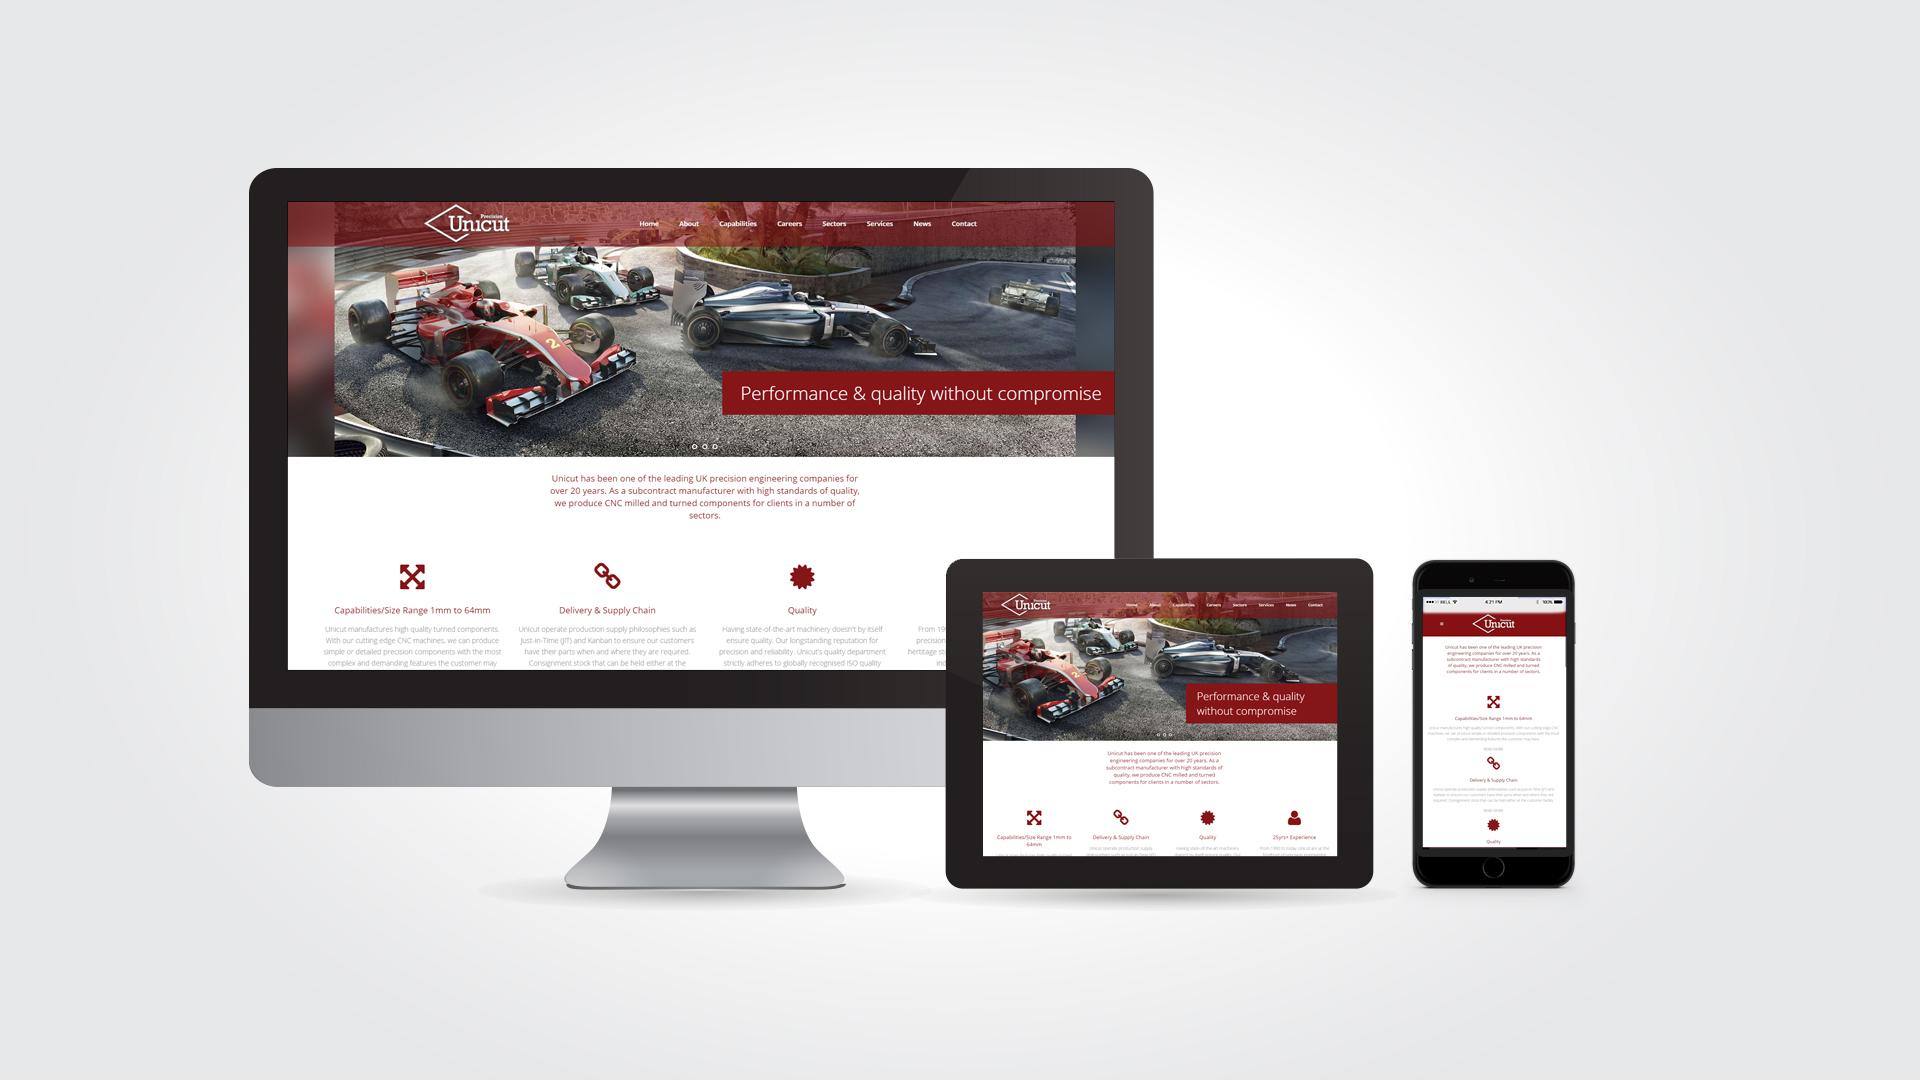 Unicut web design by Austin Marketing